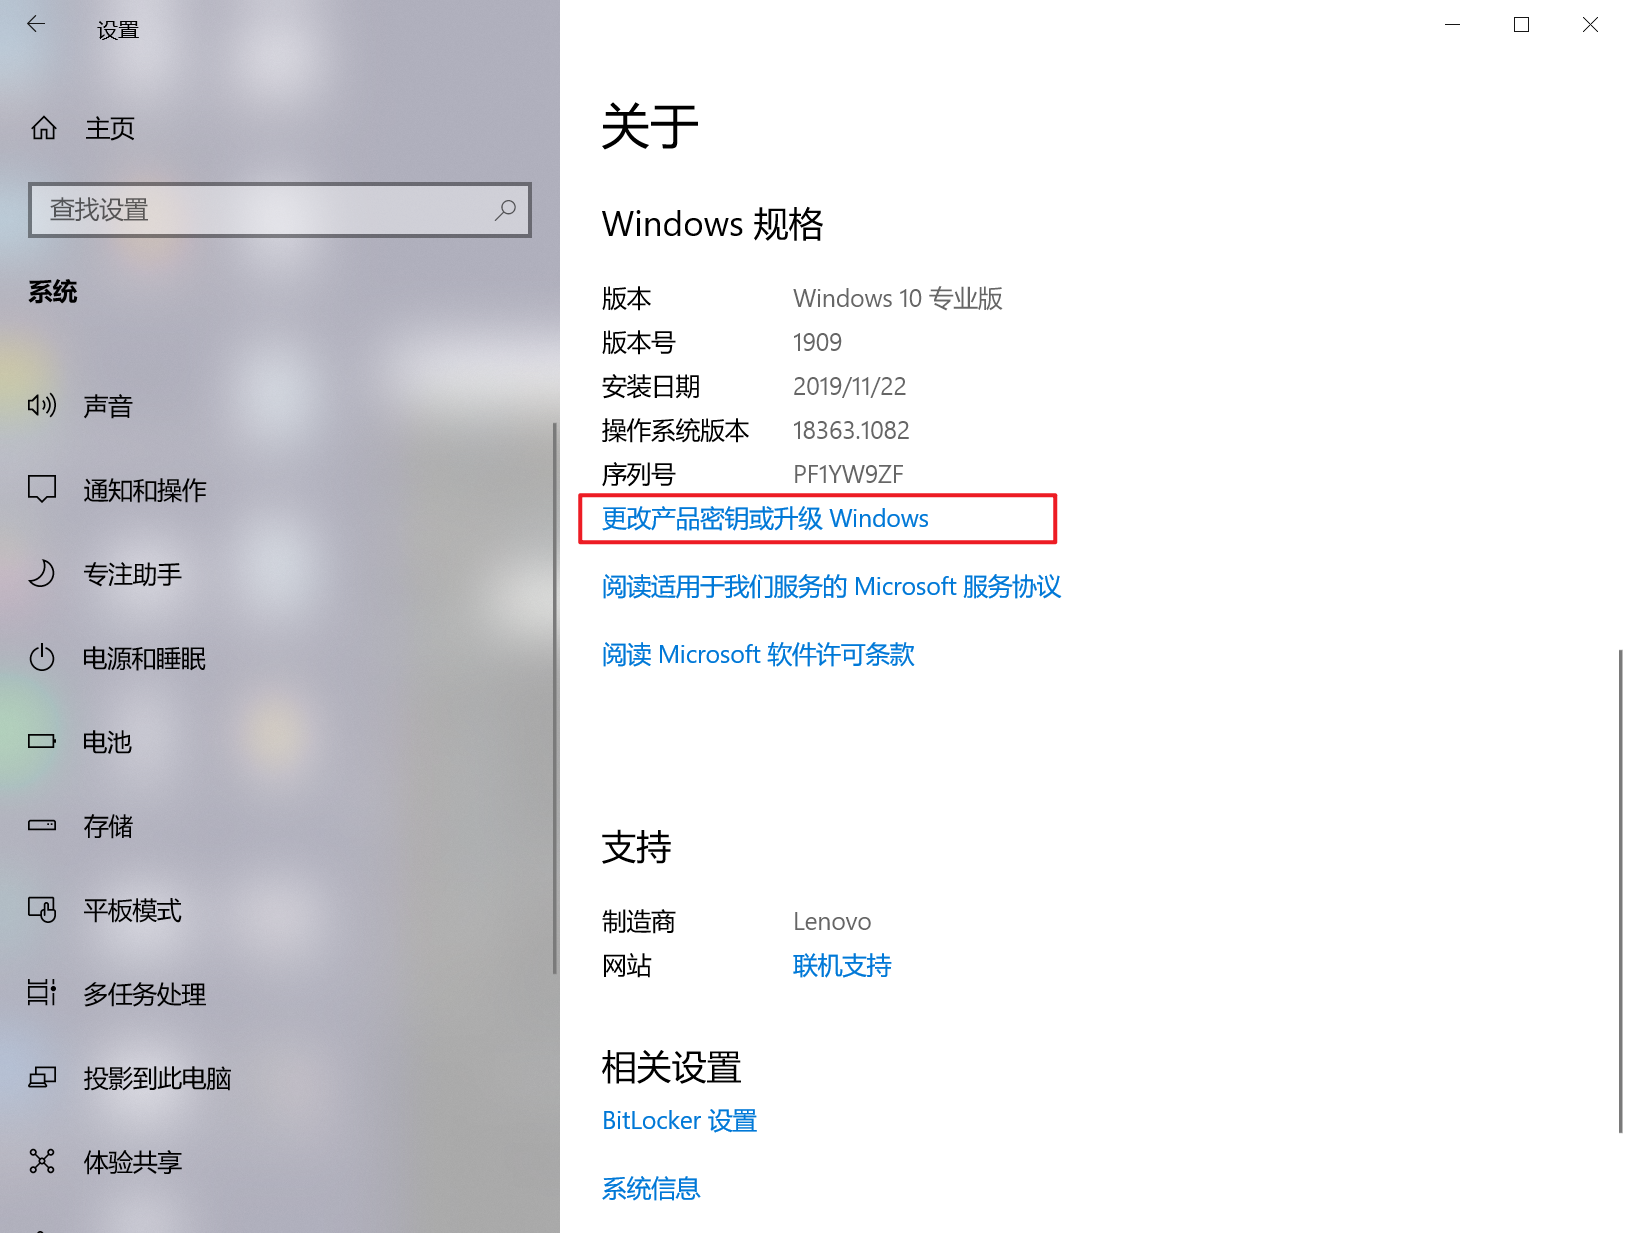 http://oss.eoway.cn/upload/files/2020-10-08-20-56-28-rn608.png